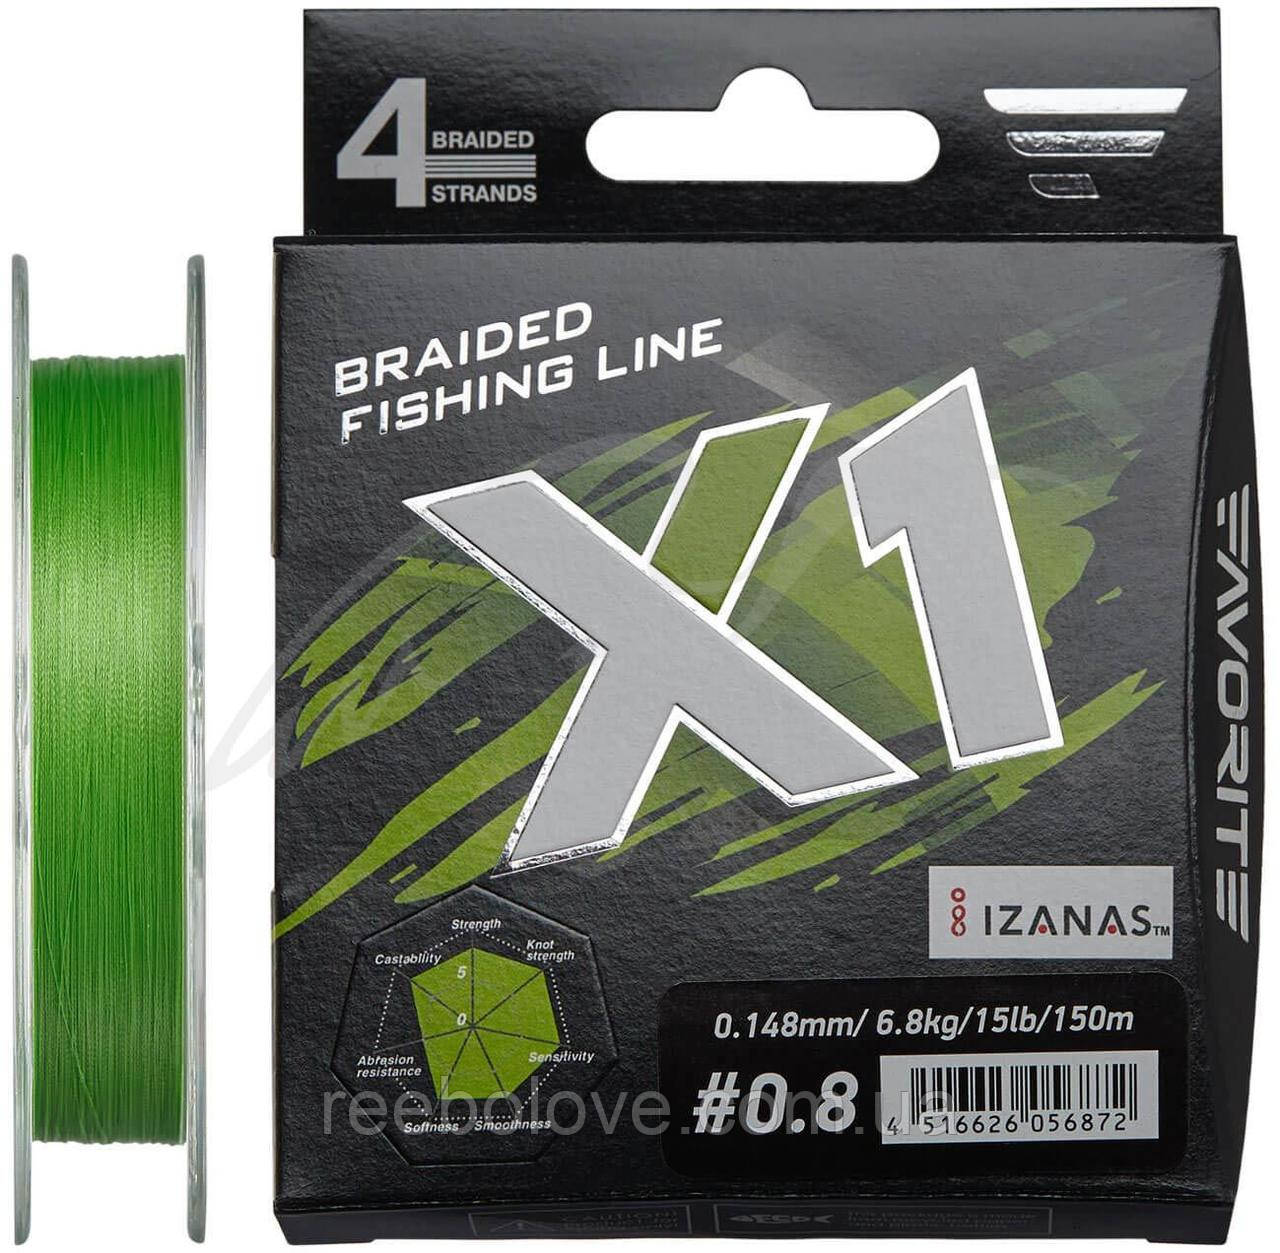 Шнур Favorite X1 PE 4x 150m (l.green) #0.8/0.148 mm 15lb/6.8 kg